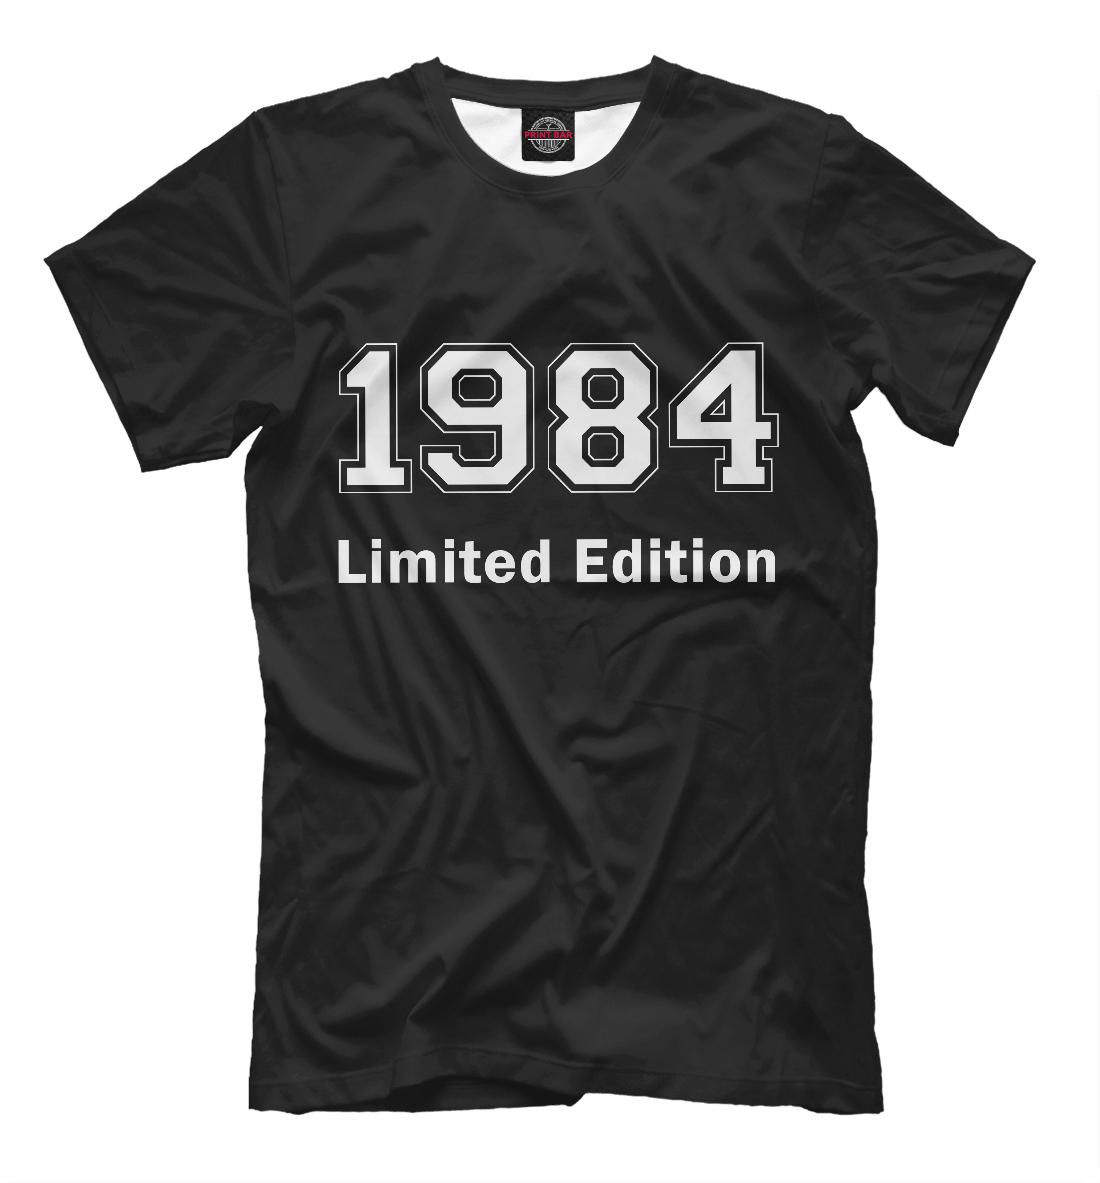 Купить 1984 Limited Edition, Printbar, Футболки, DVC-465851-fut-2